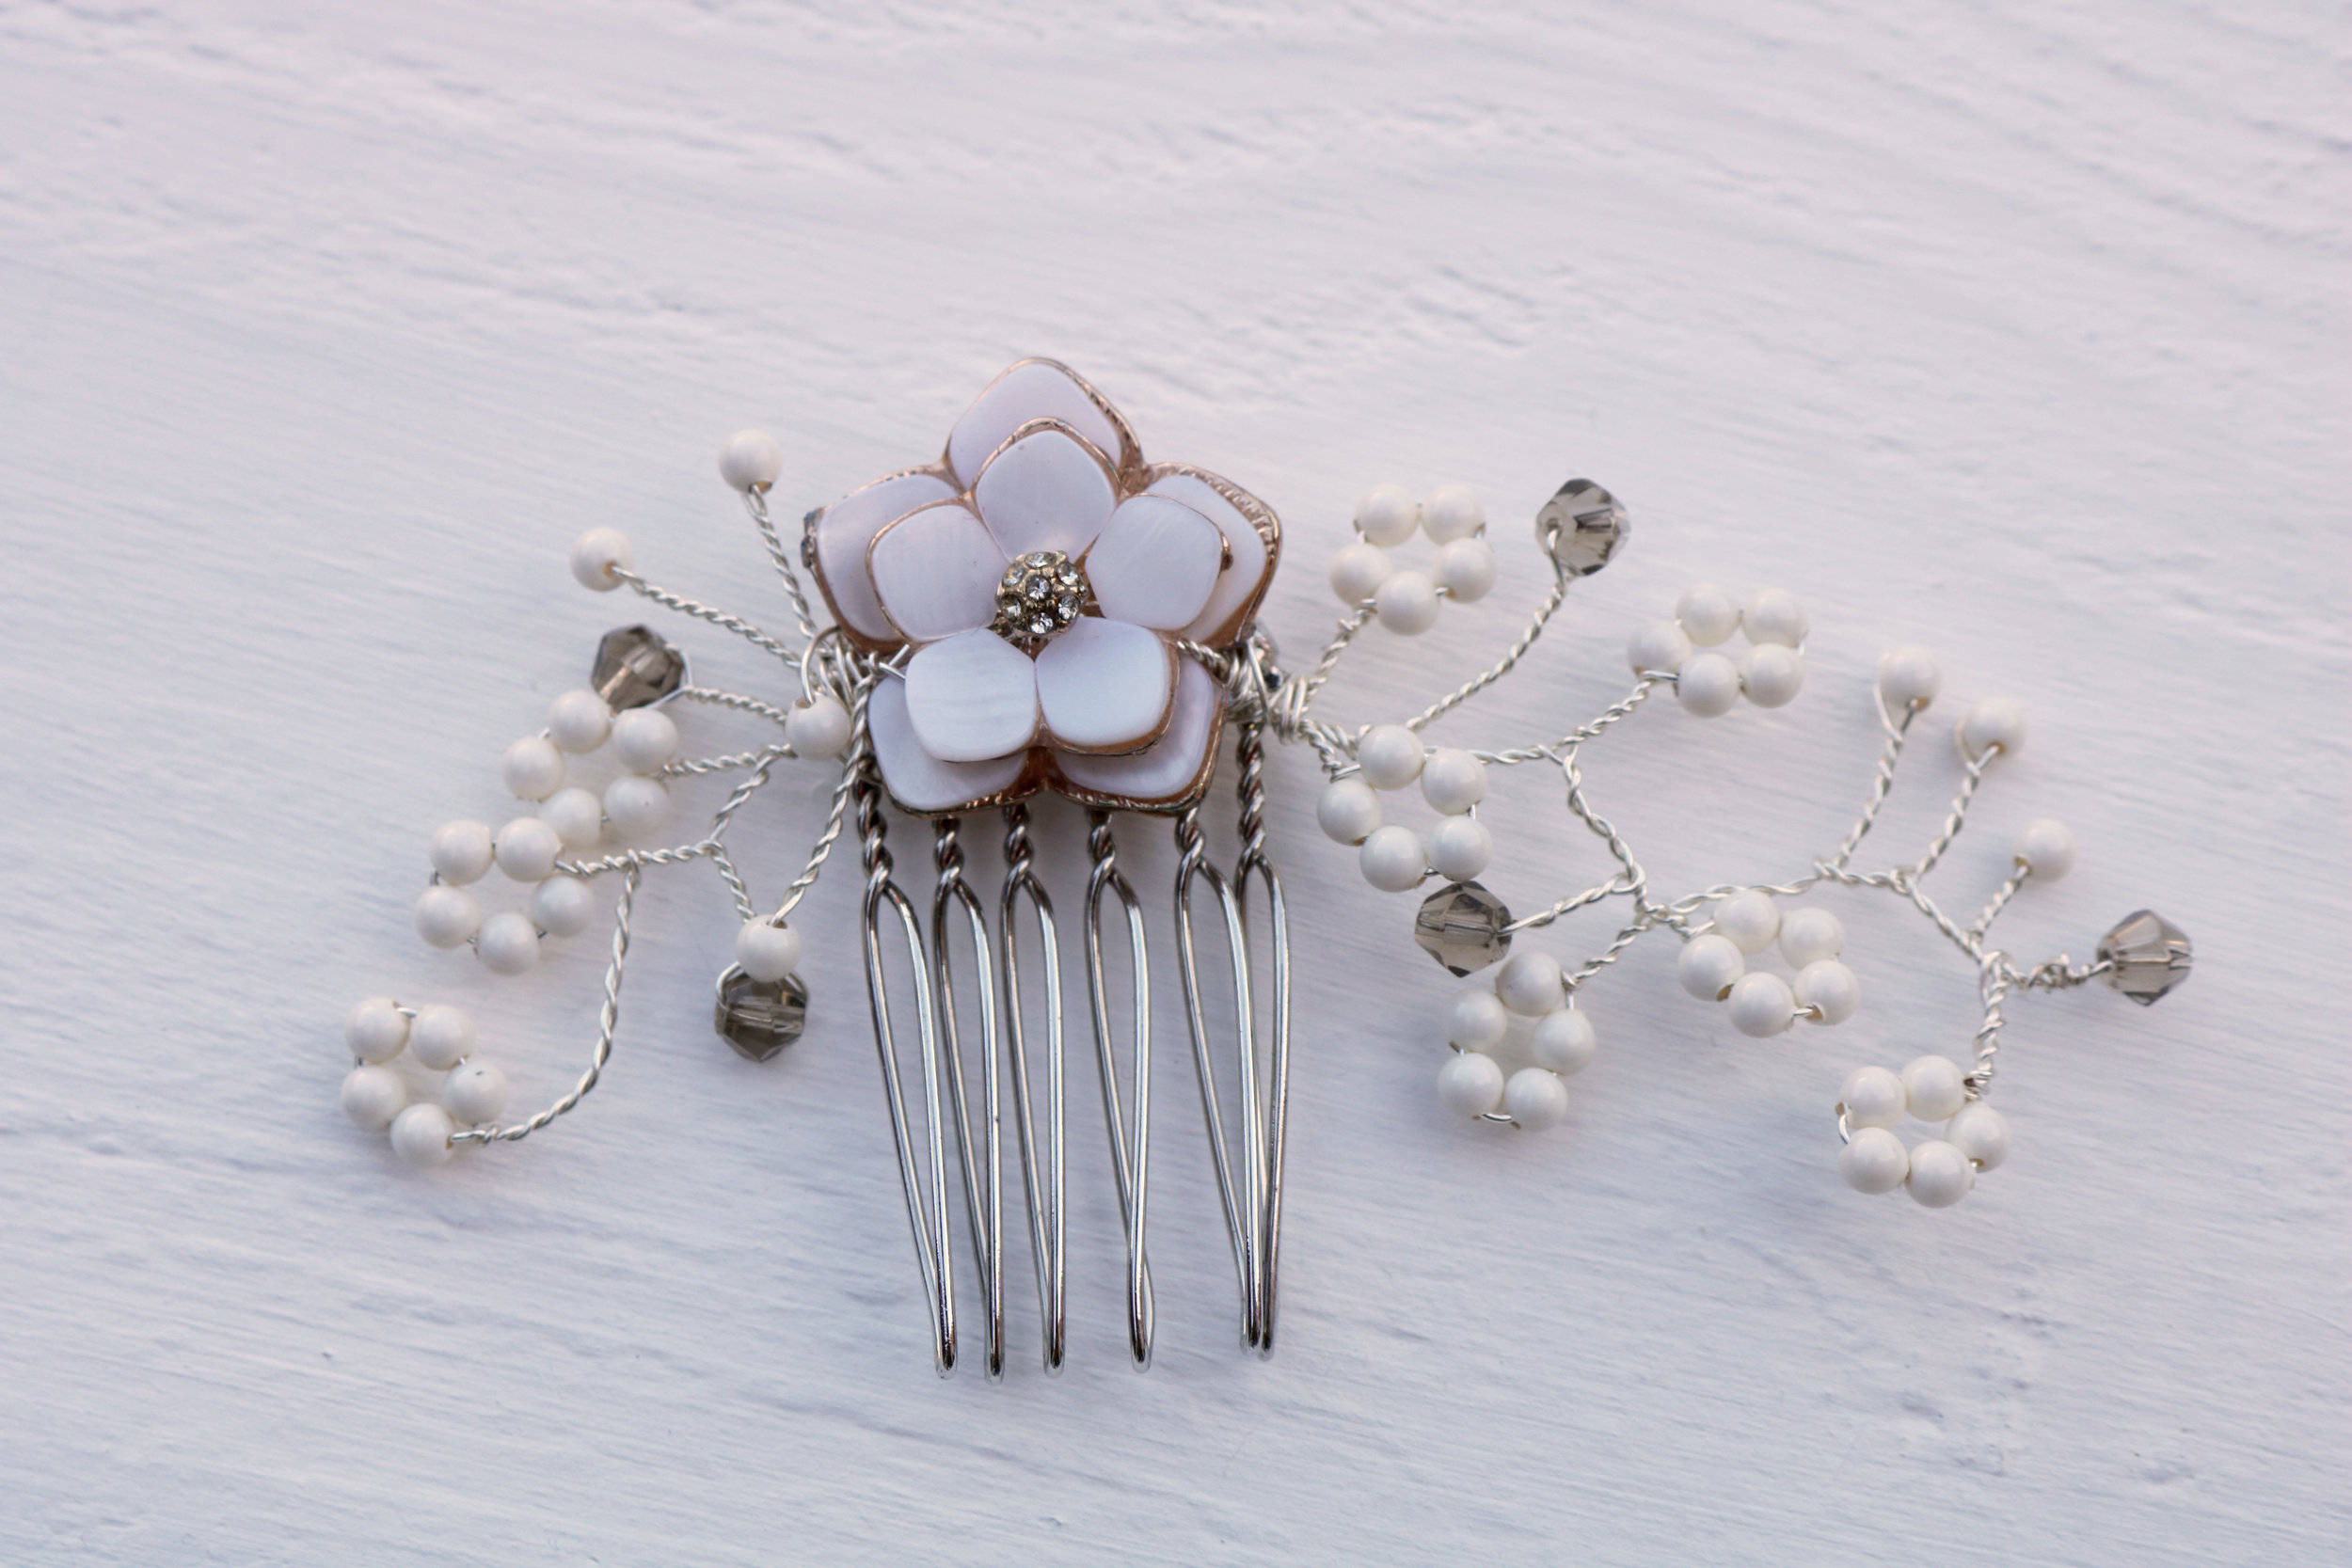 Blossom comb by Elsa Rose Boutique